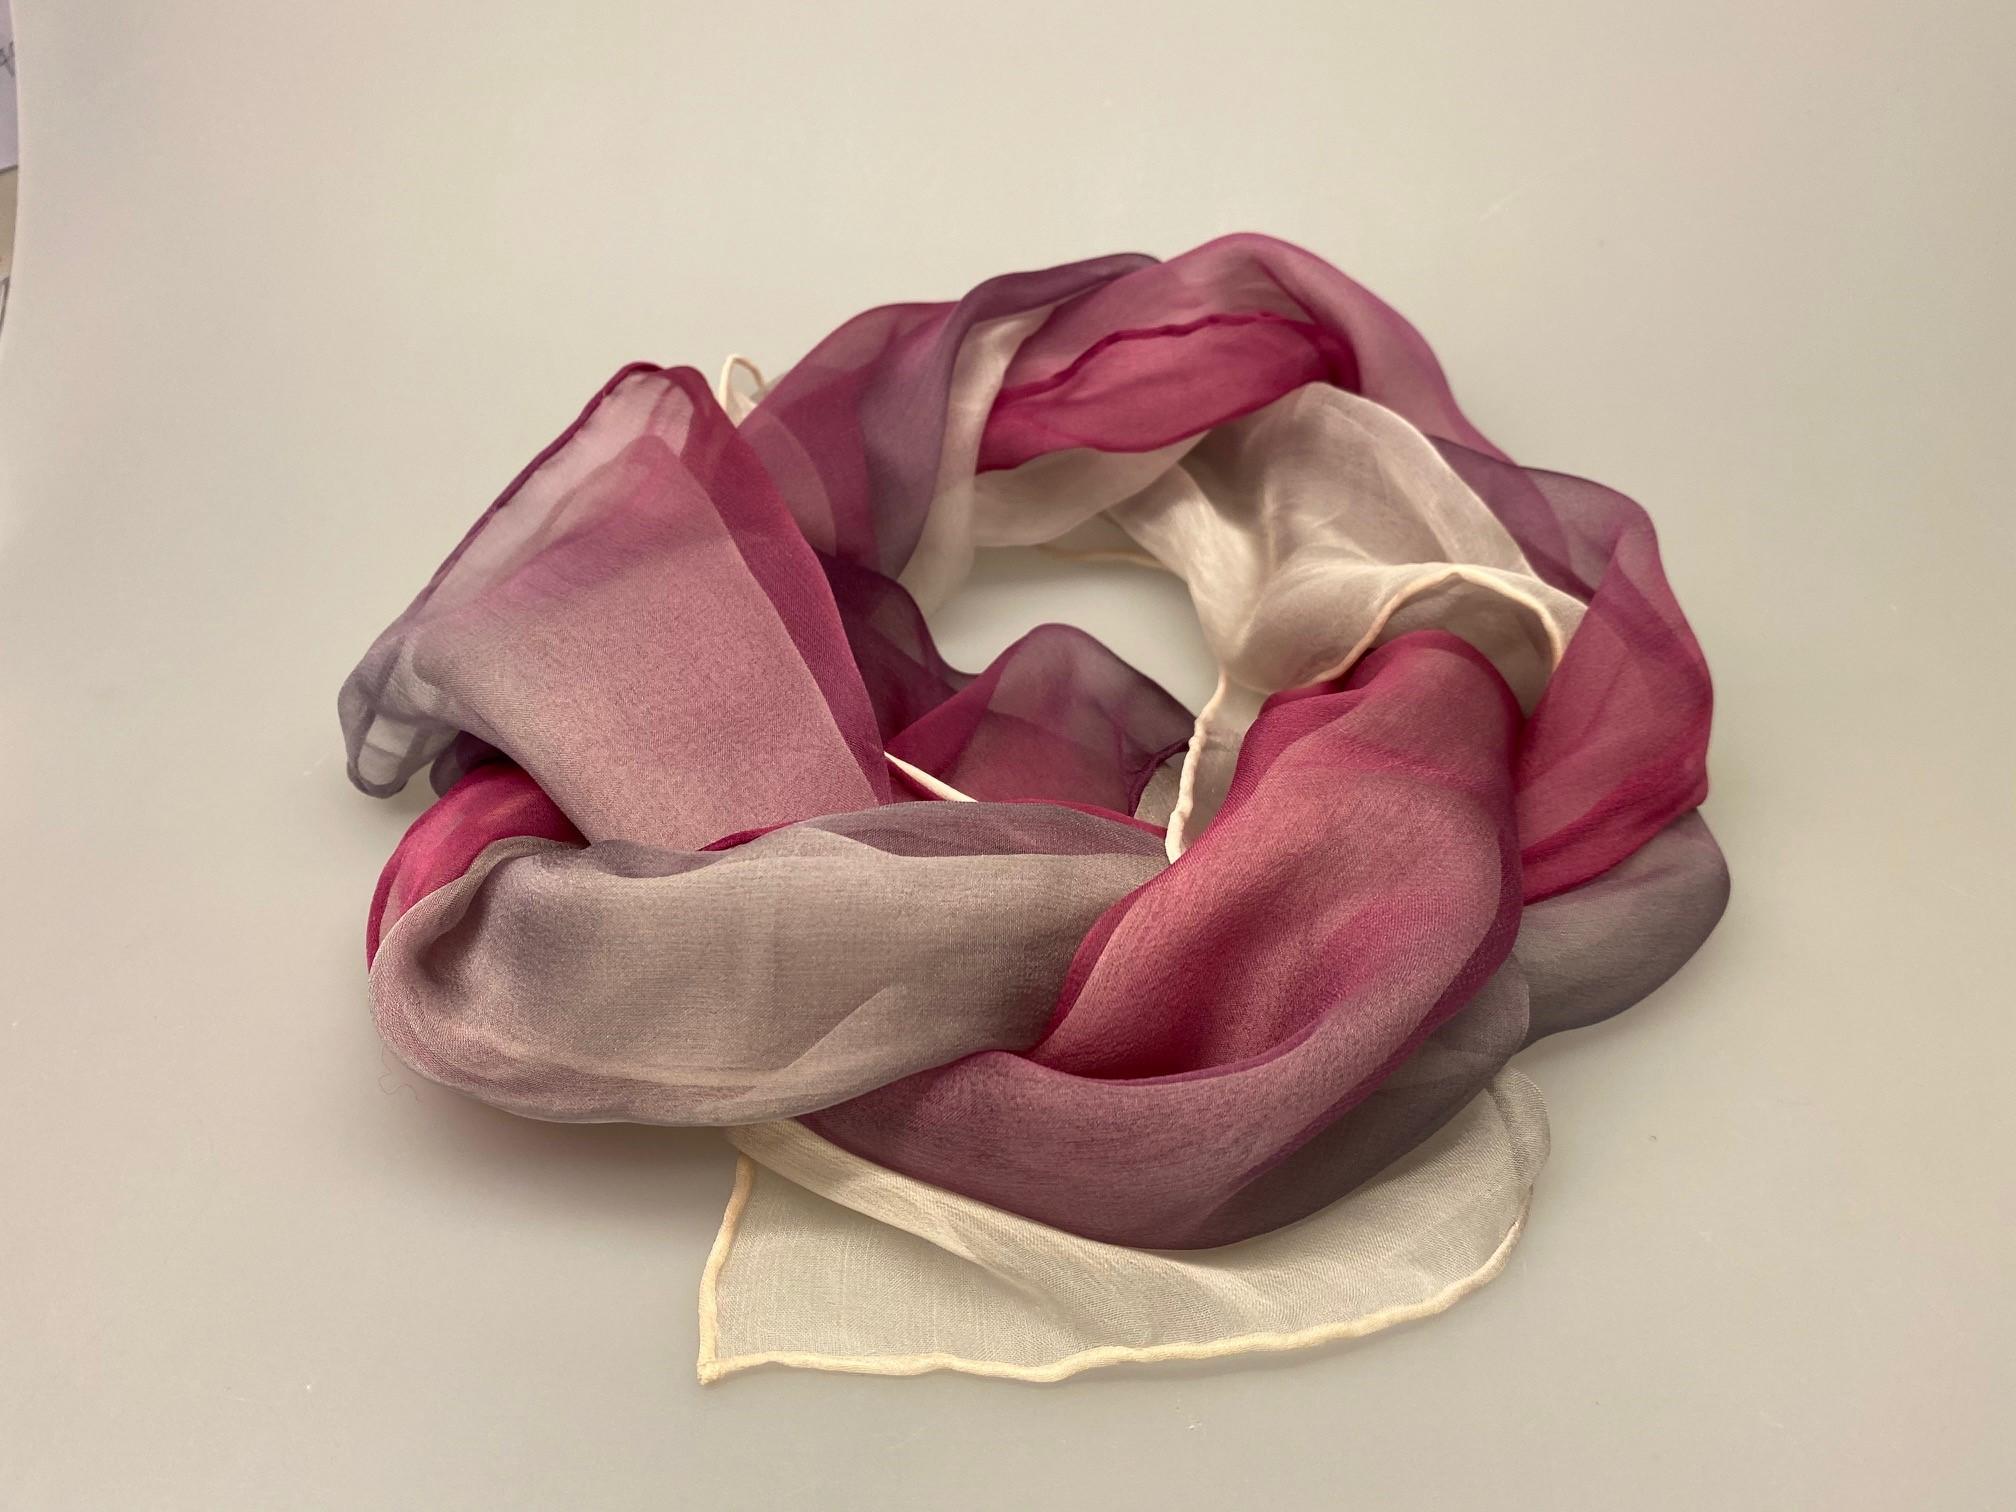 1158-176, Silkechiffon Tørklæde 1158 - Lyng/Lilla/Hvid - Lyng/Lilla/Hvid,Silke, hvid, lyngfarvet, lilla, lynglilla, rosa, silke, ren silke, silketørklæde, silkechiffon, let, stort, volumen, sjal, stola, fest, festtøj, elegant, kvalitet, flot, kor, gave, gaveide, rund fødselsdag, biti, ribe